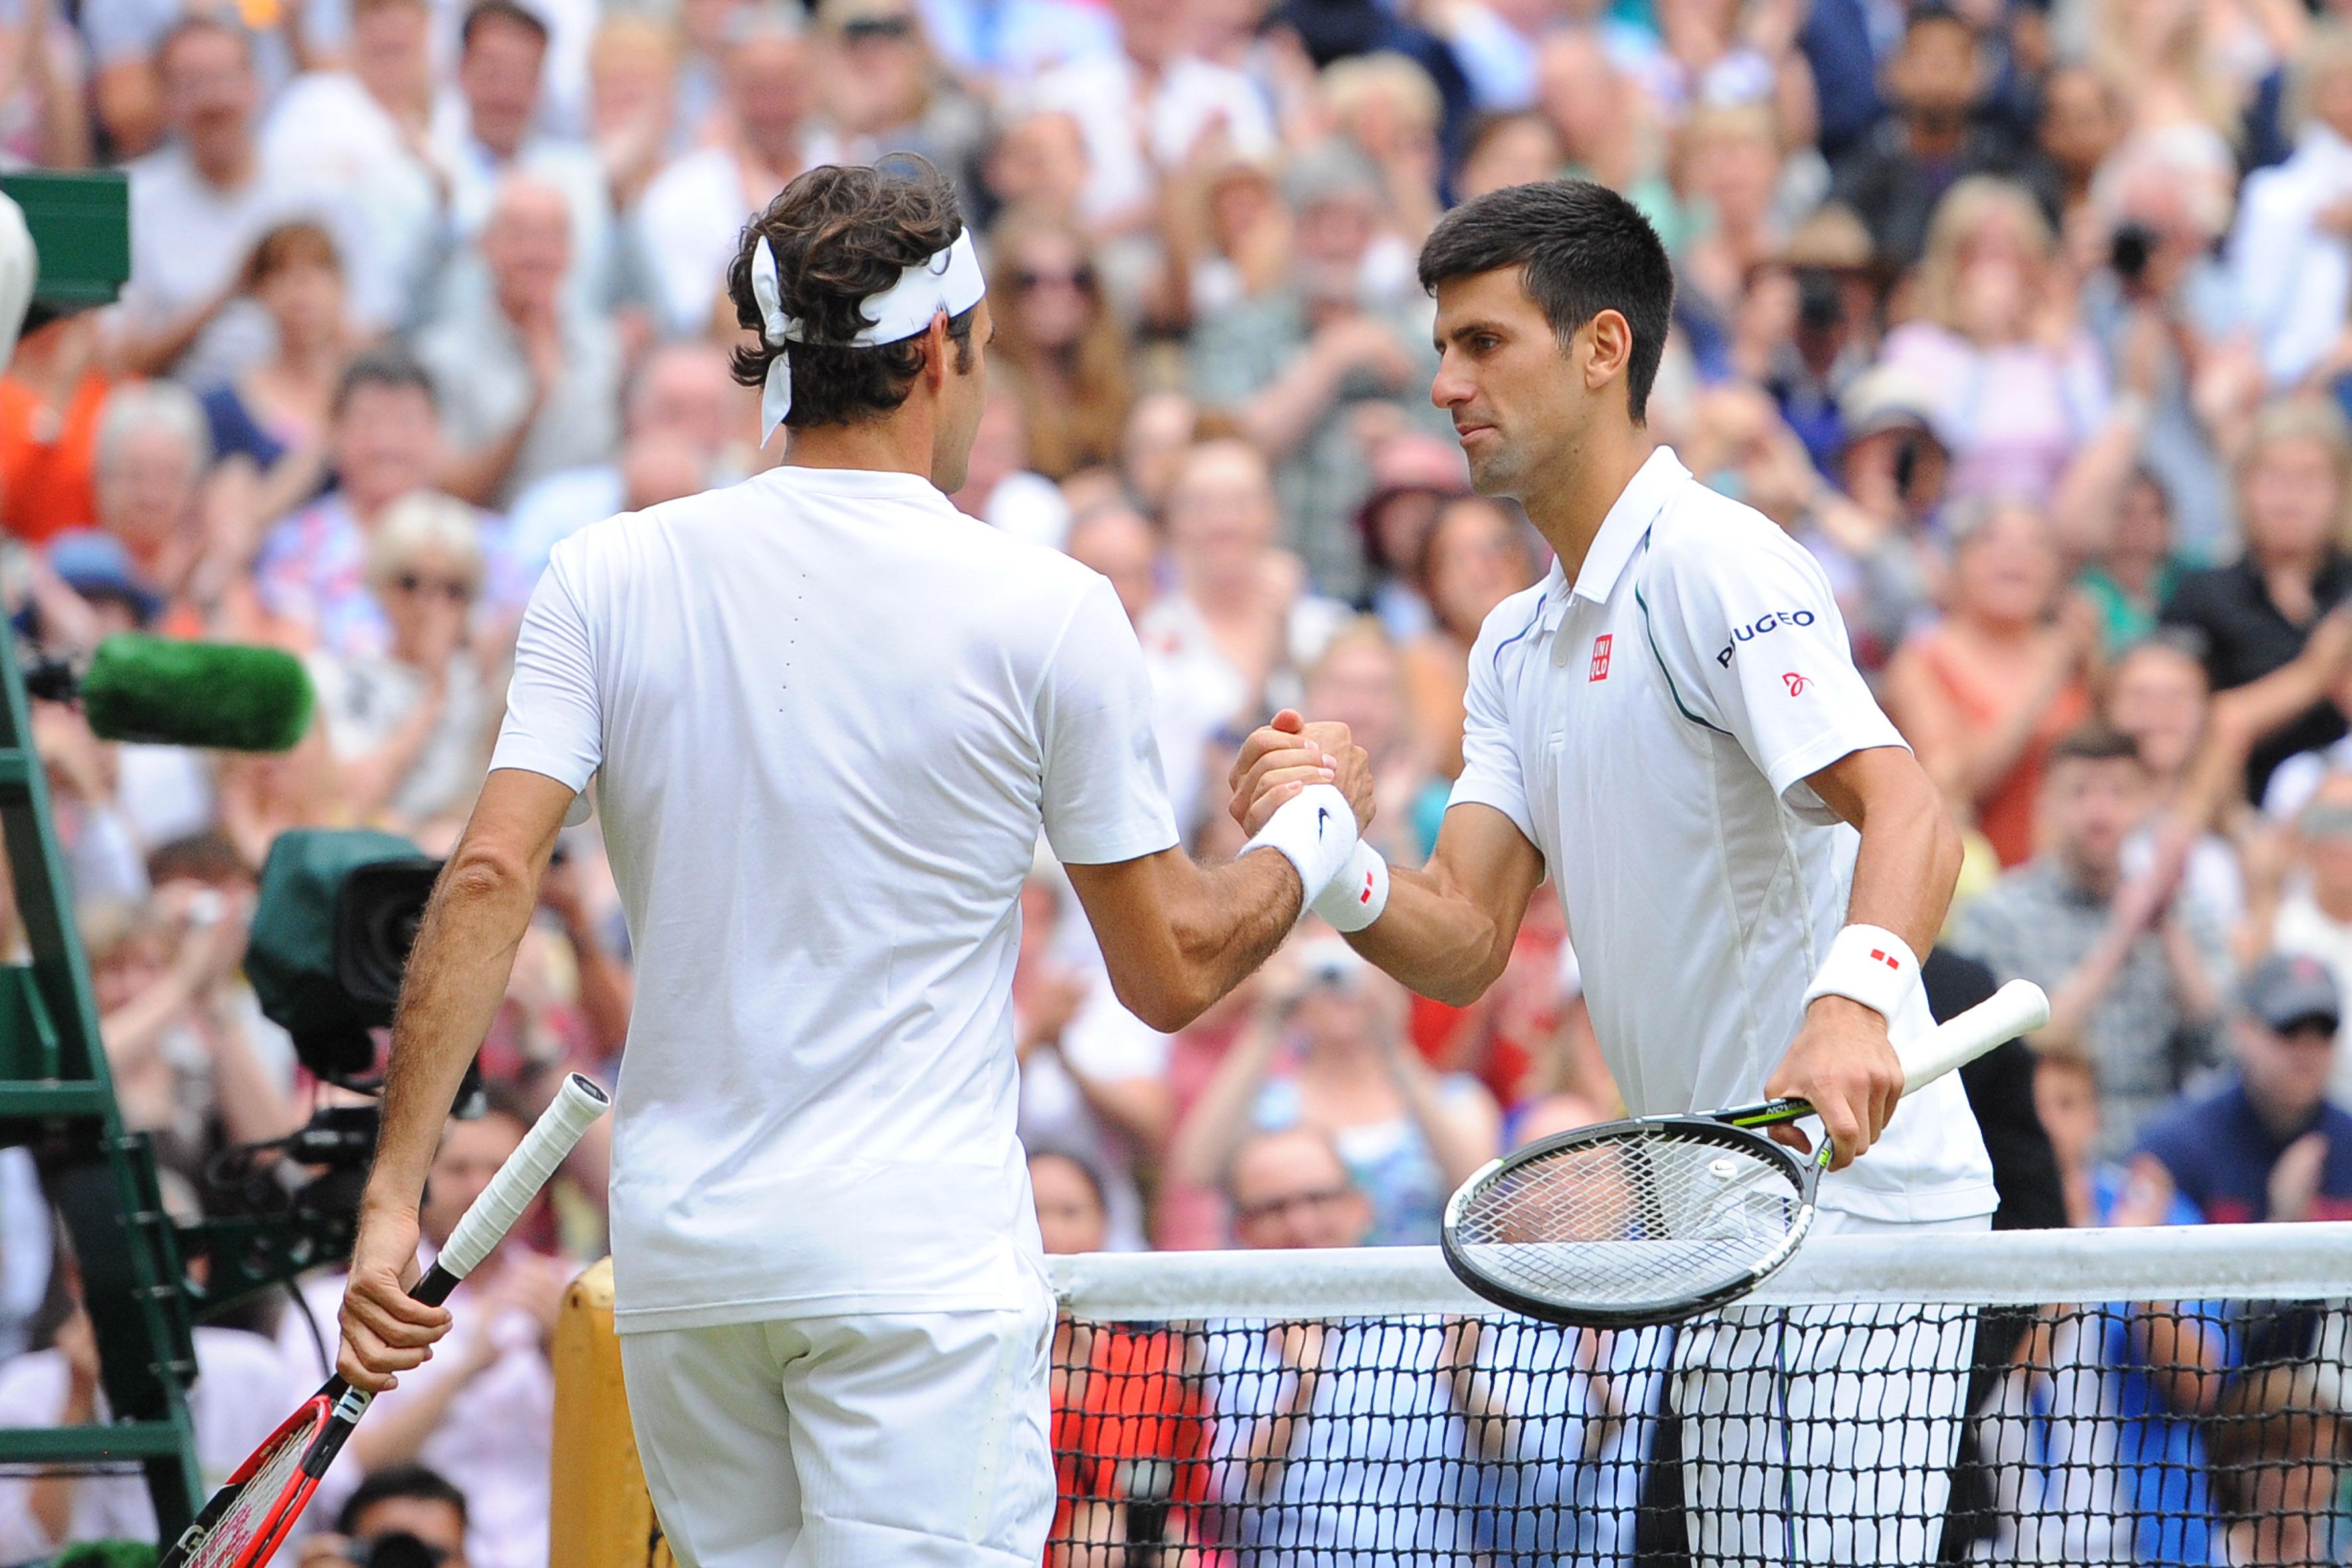 Djokovic Federer : Leurs trois affrontements à Wimbledon à